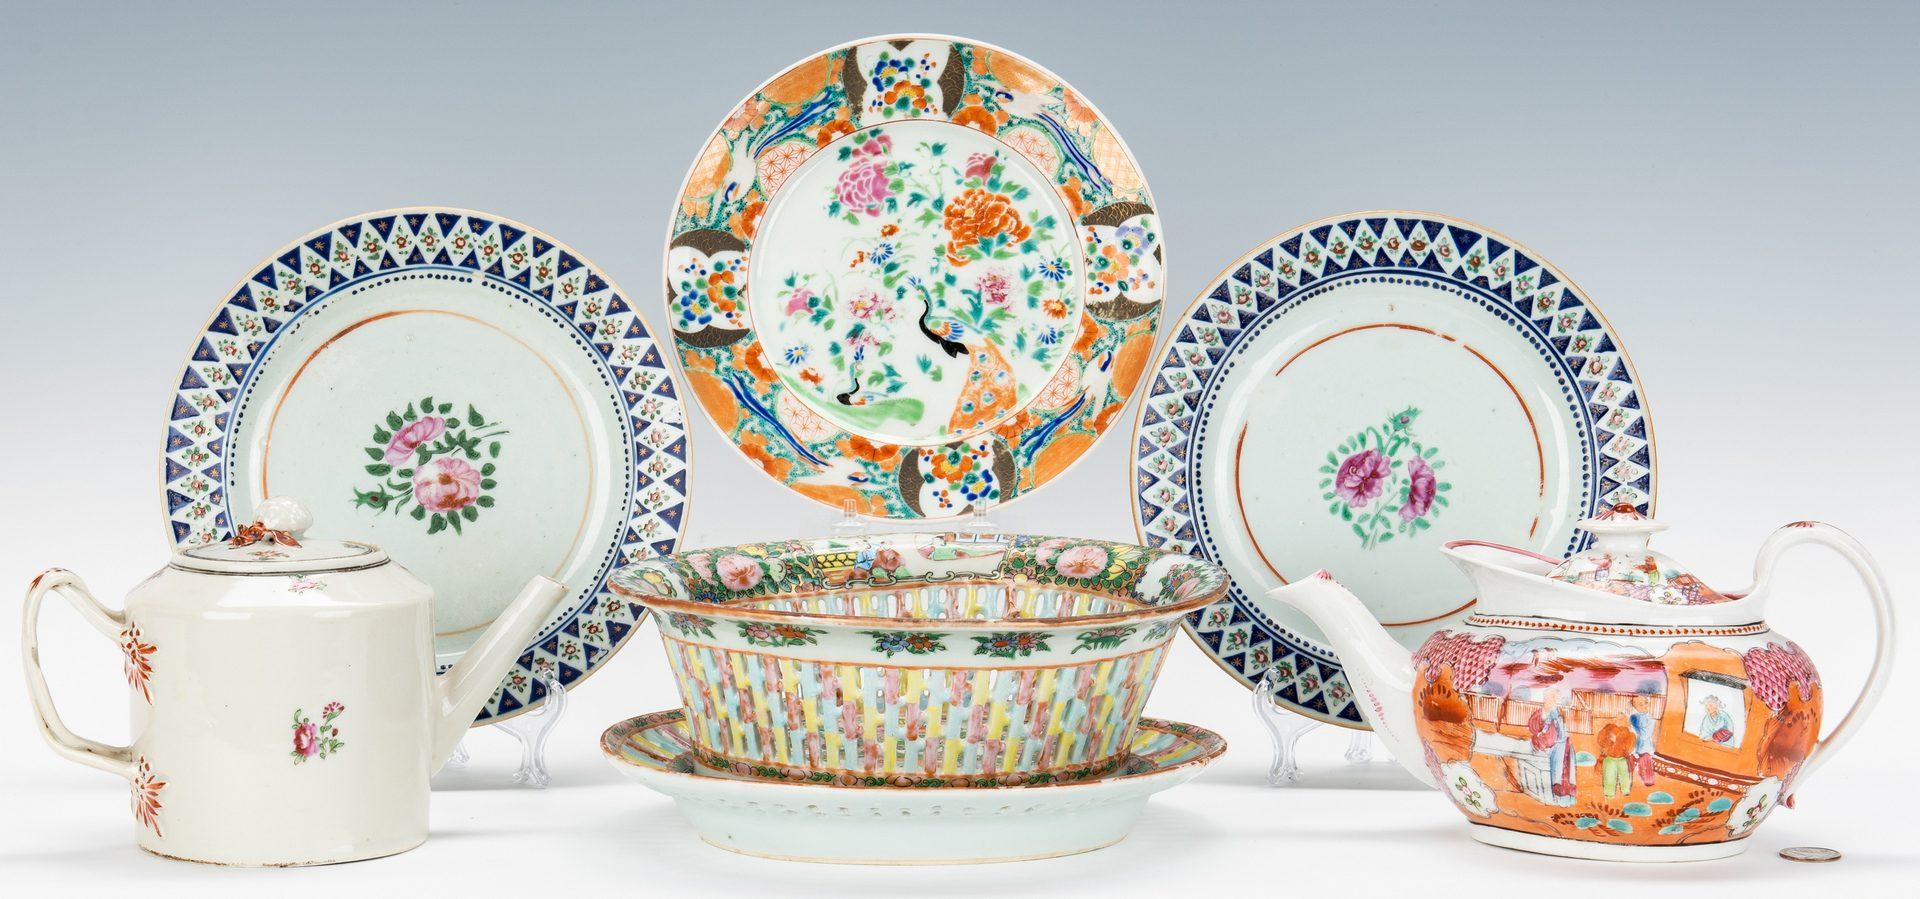 Lot 325: 6 Asian & English Porcelain Table Items, incl. teapots